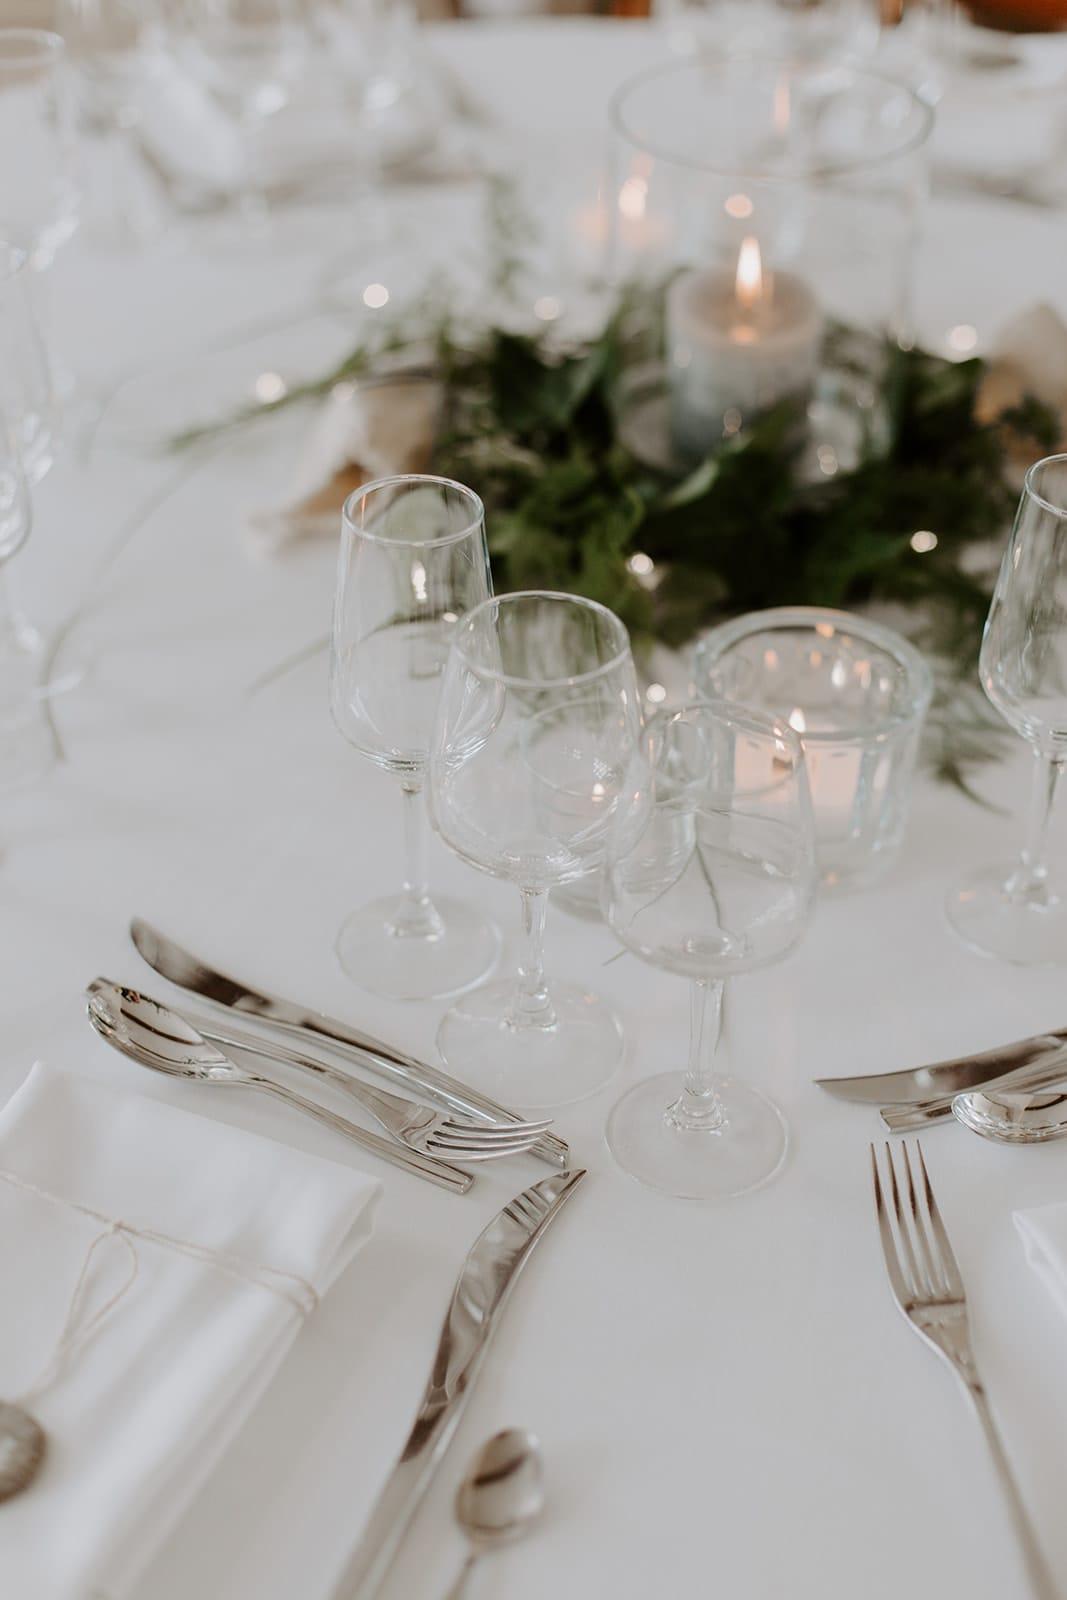 mariage_chateau_la_flocelliere_vendee_flavie_nelly_photographe-35-obonheurdesdames-decoration-mariage-location-vegetal